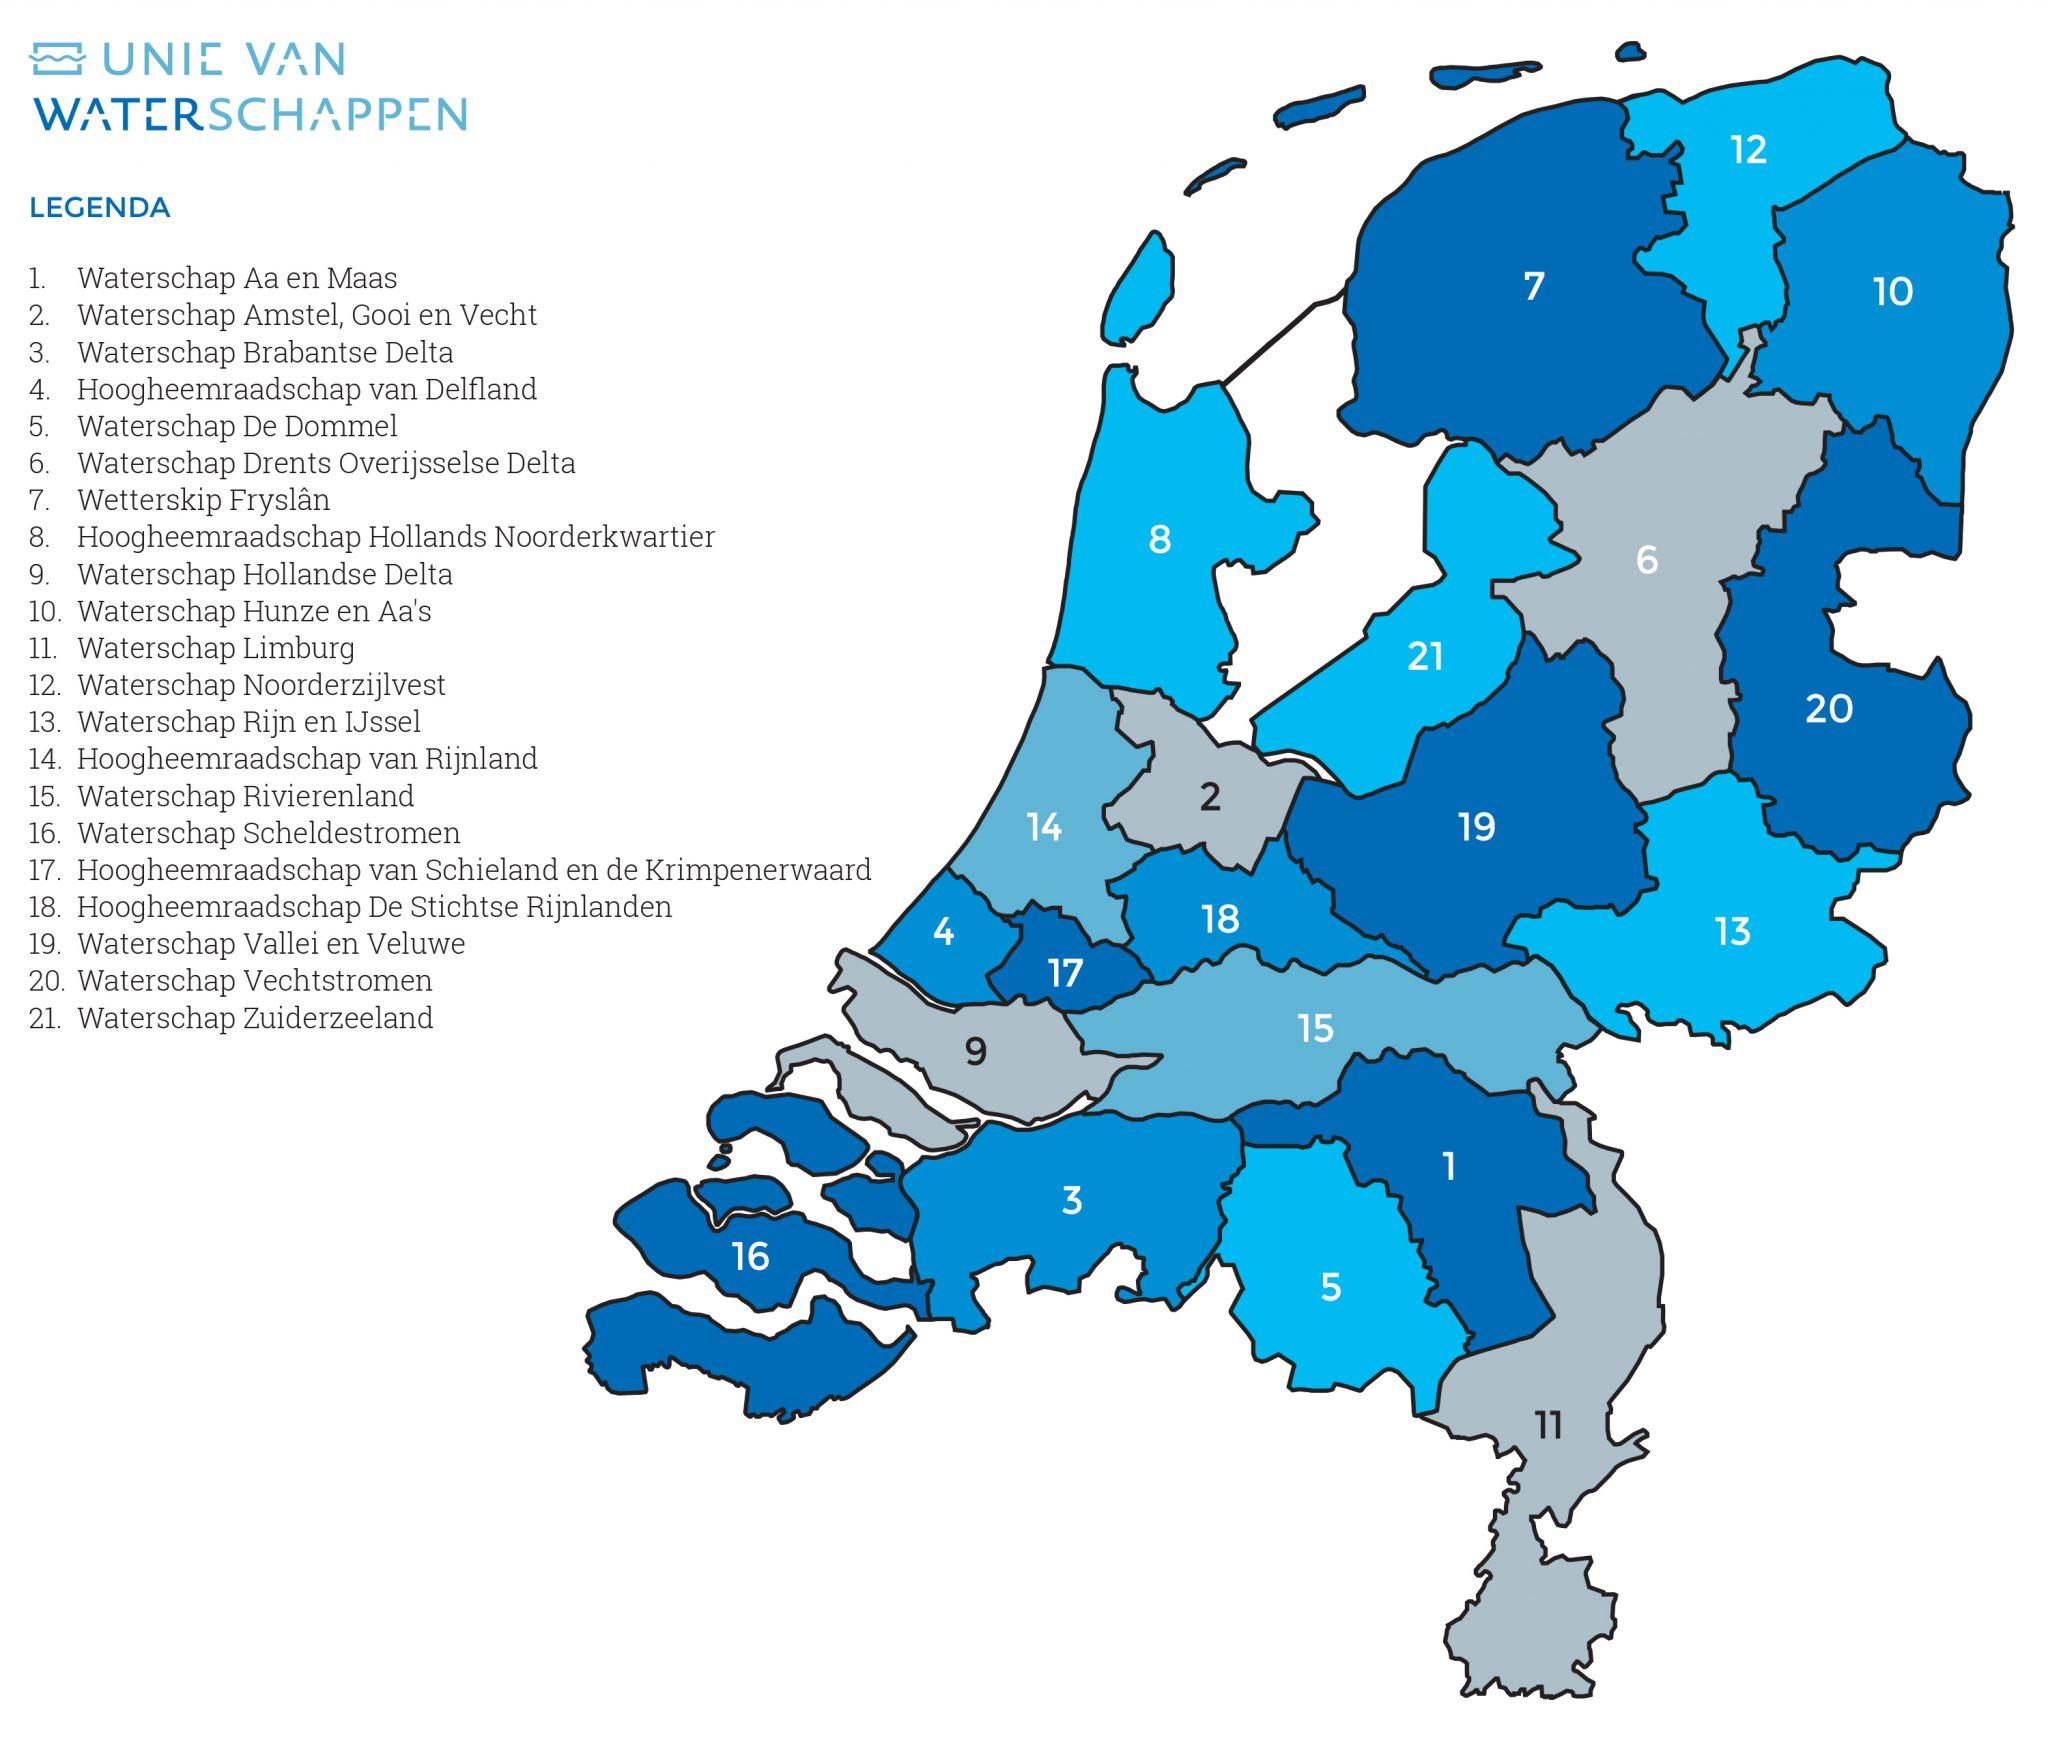 https://www.uvw.nl/wp-content/uploads/2018/10/Waterschapskaart-2018.jpg